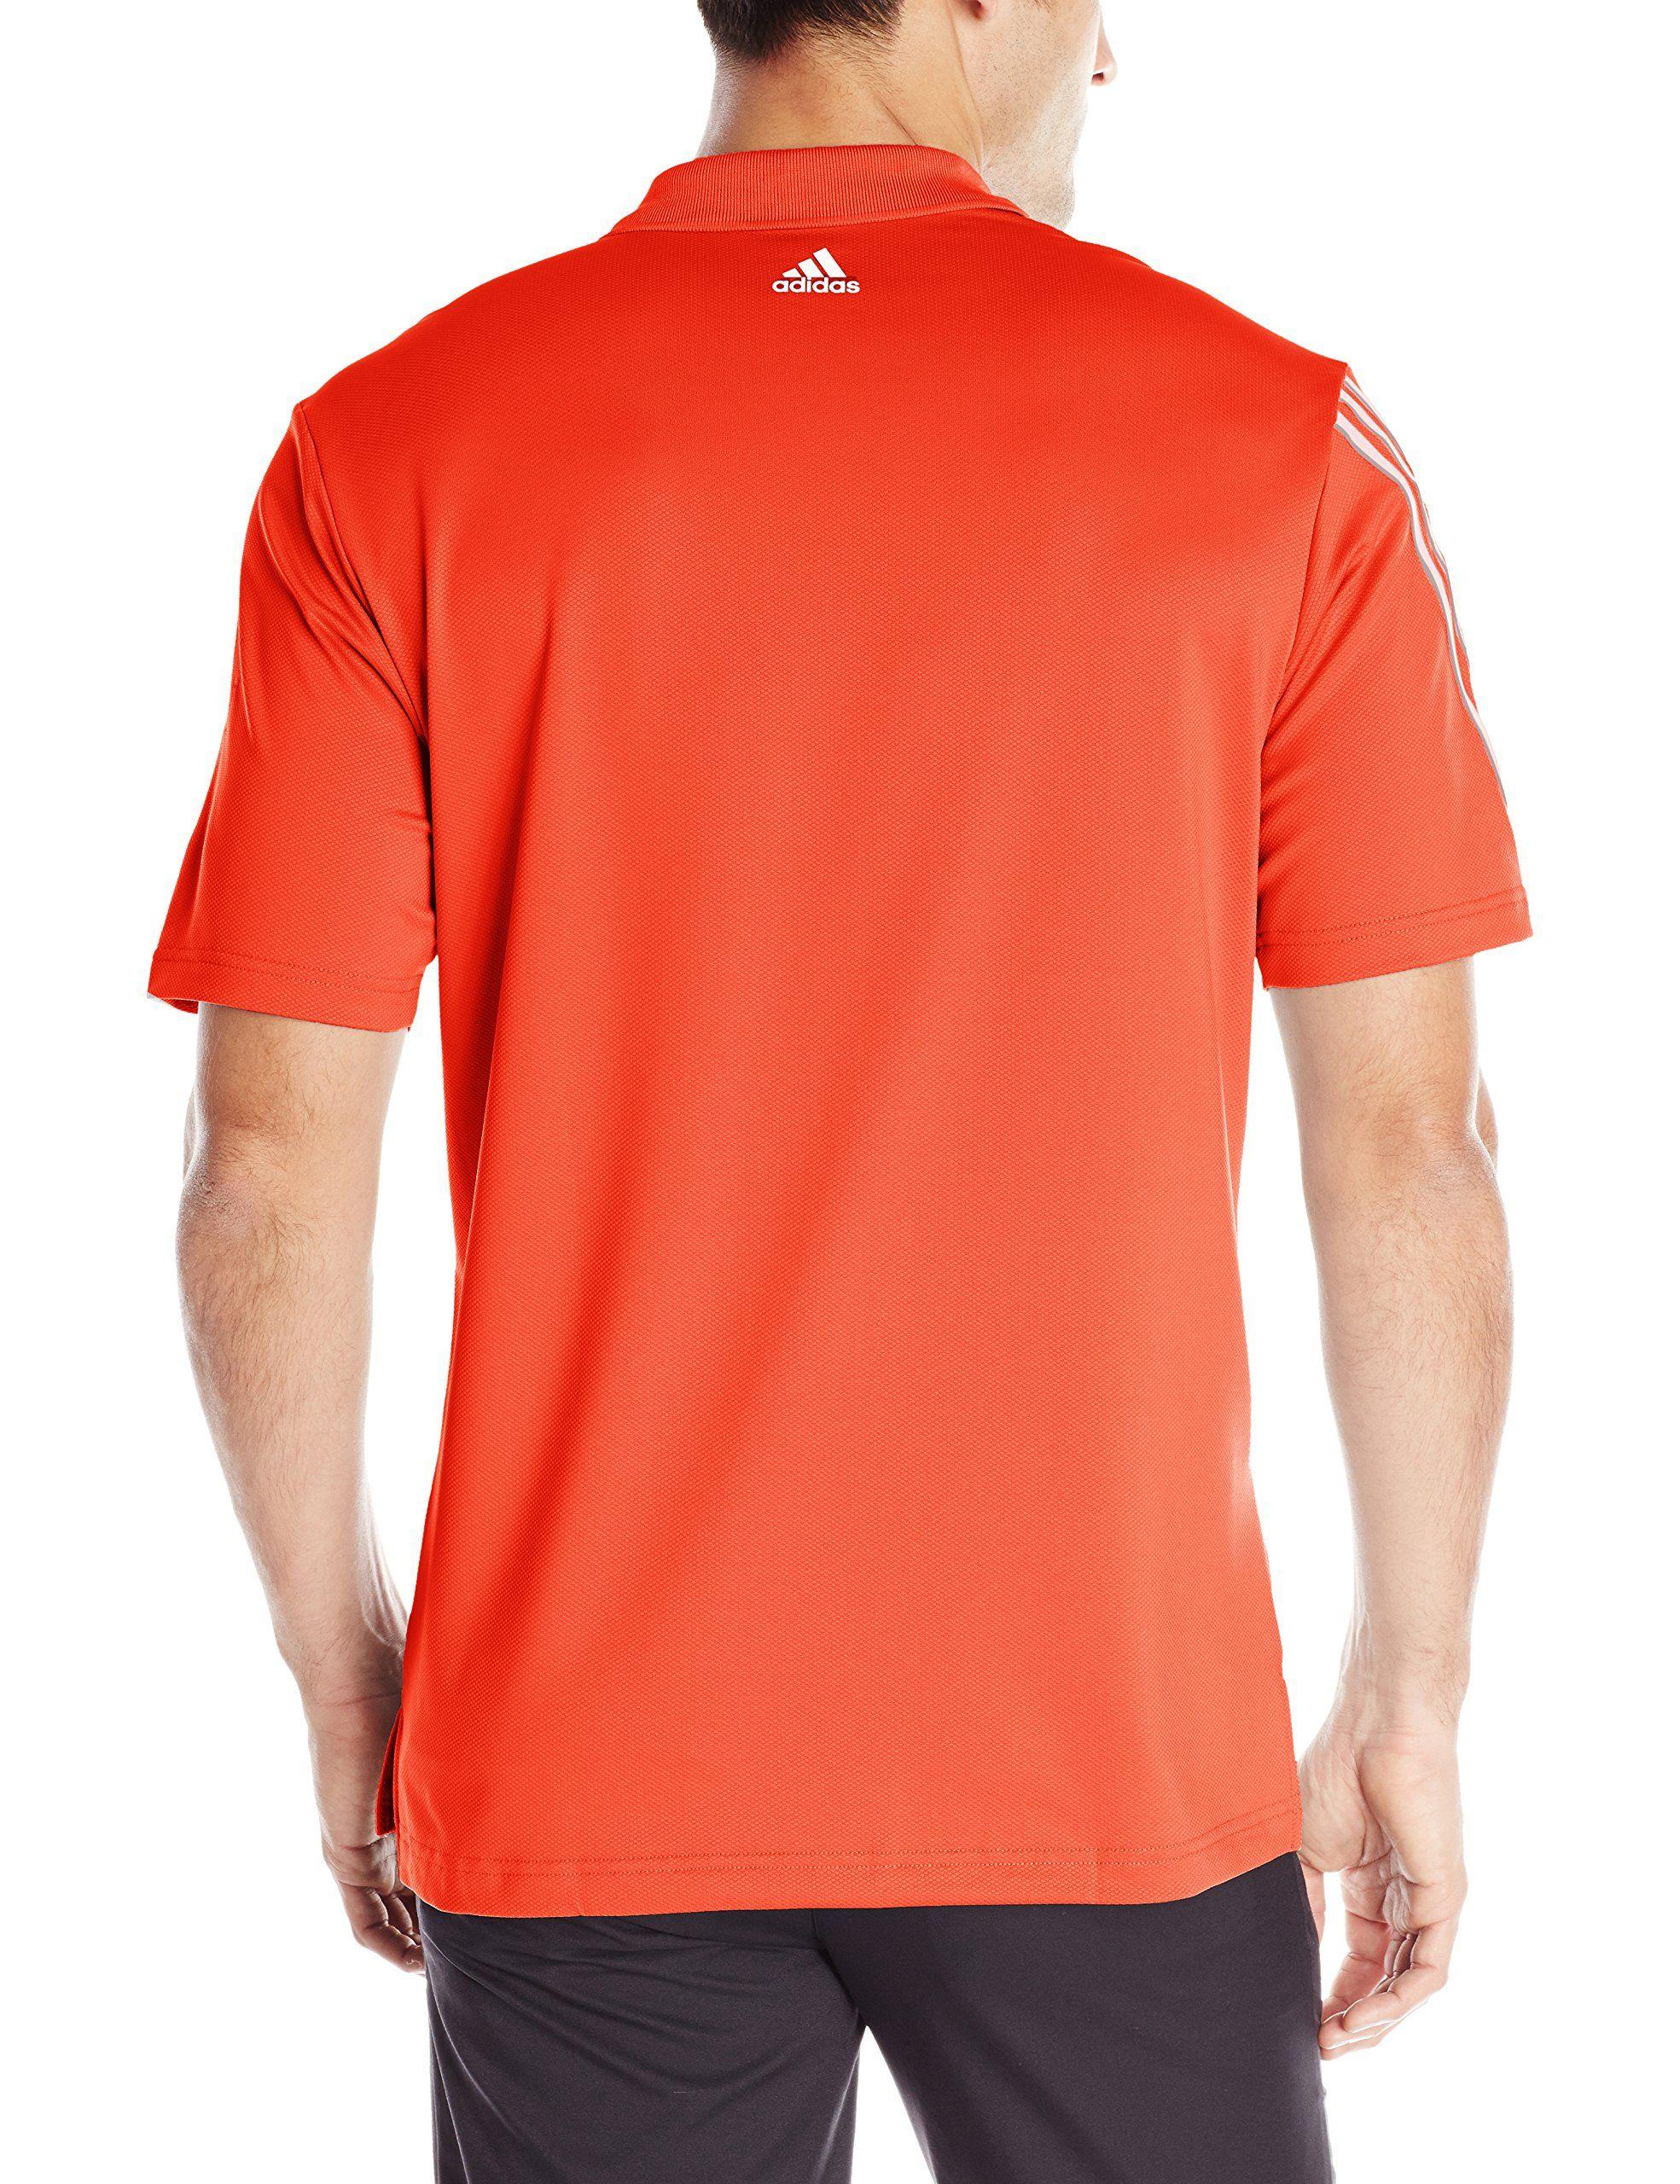 5fc3bbe2556 adidas Golf Mens Climacool 3 Stripes Polo HiRes Red Mid Grey Vista Grey  Medium